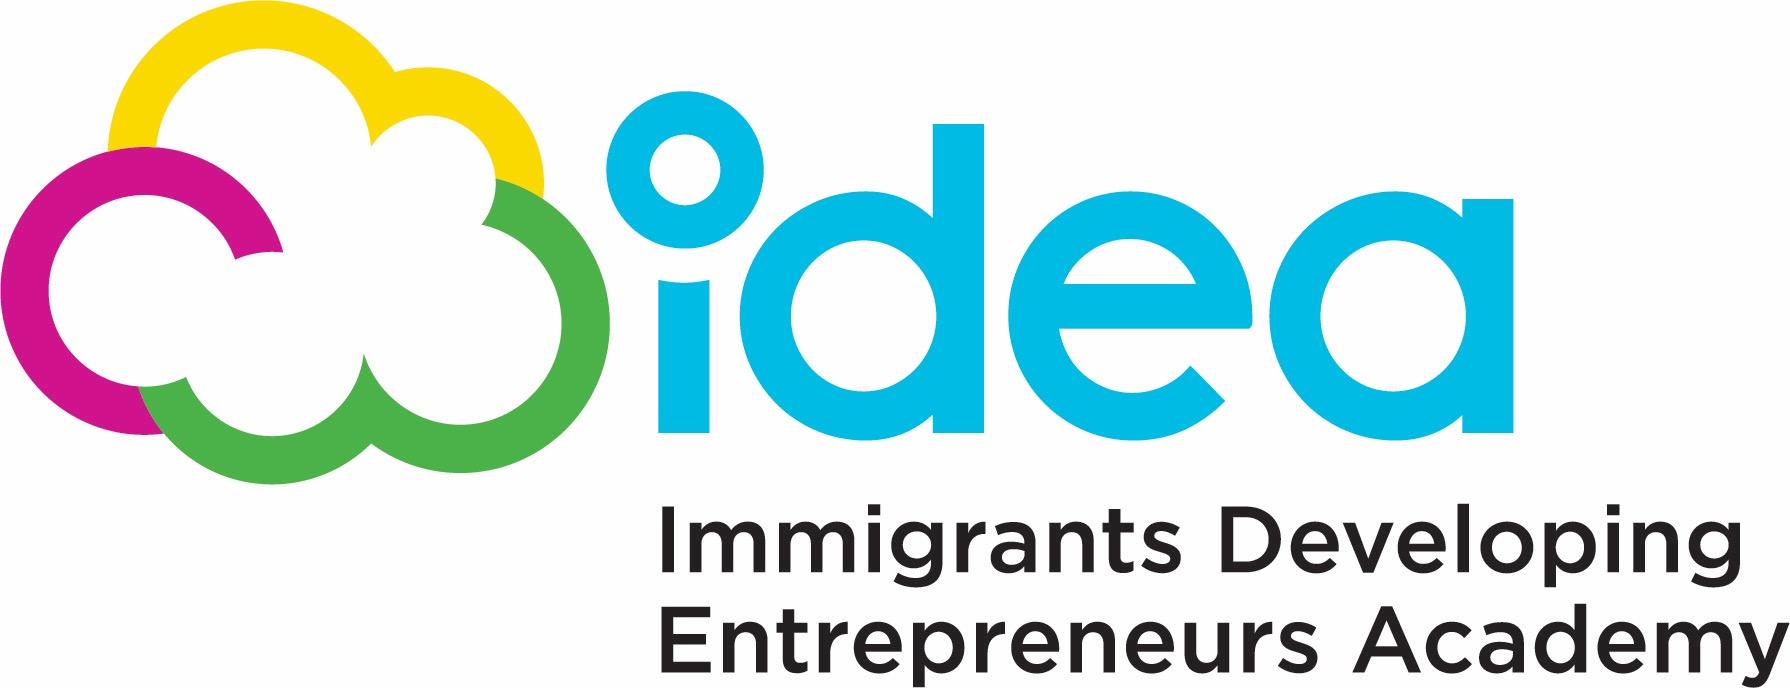 Immigrants Developing Entrepreneurs Academy